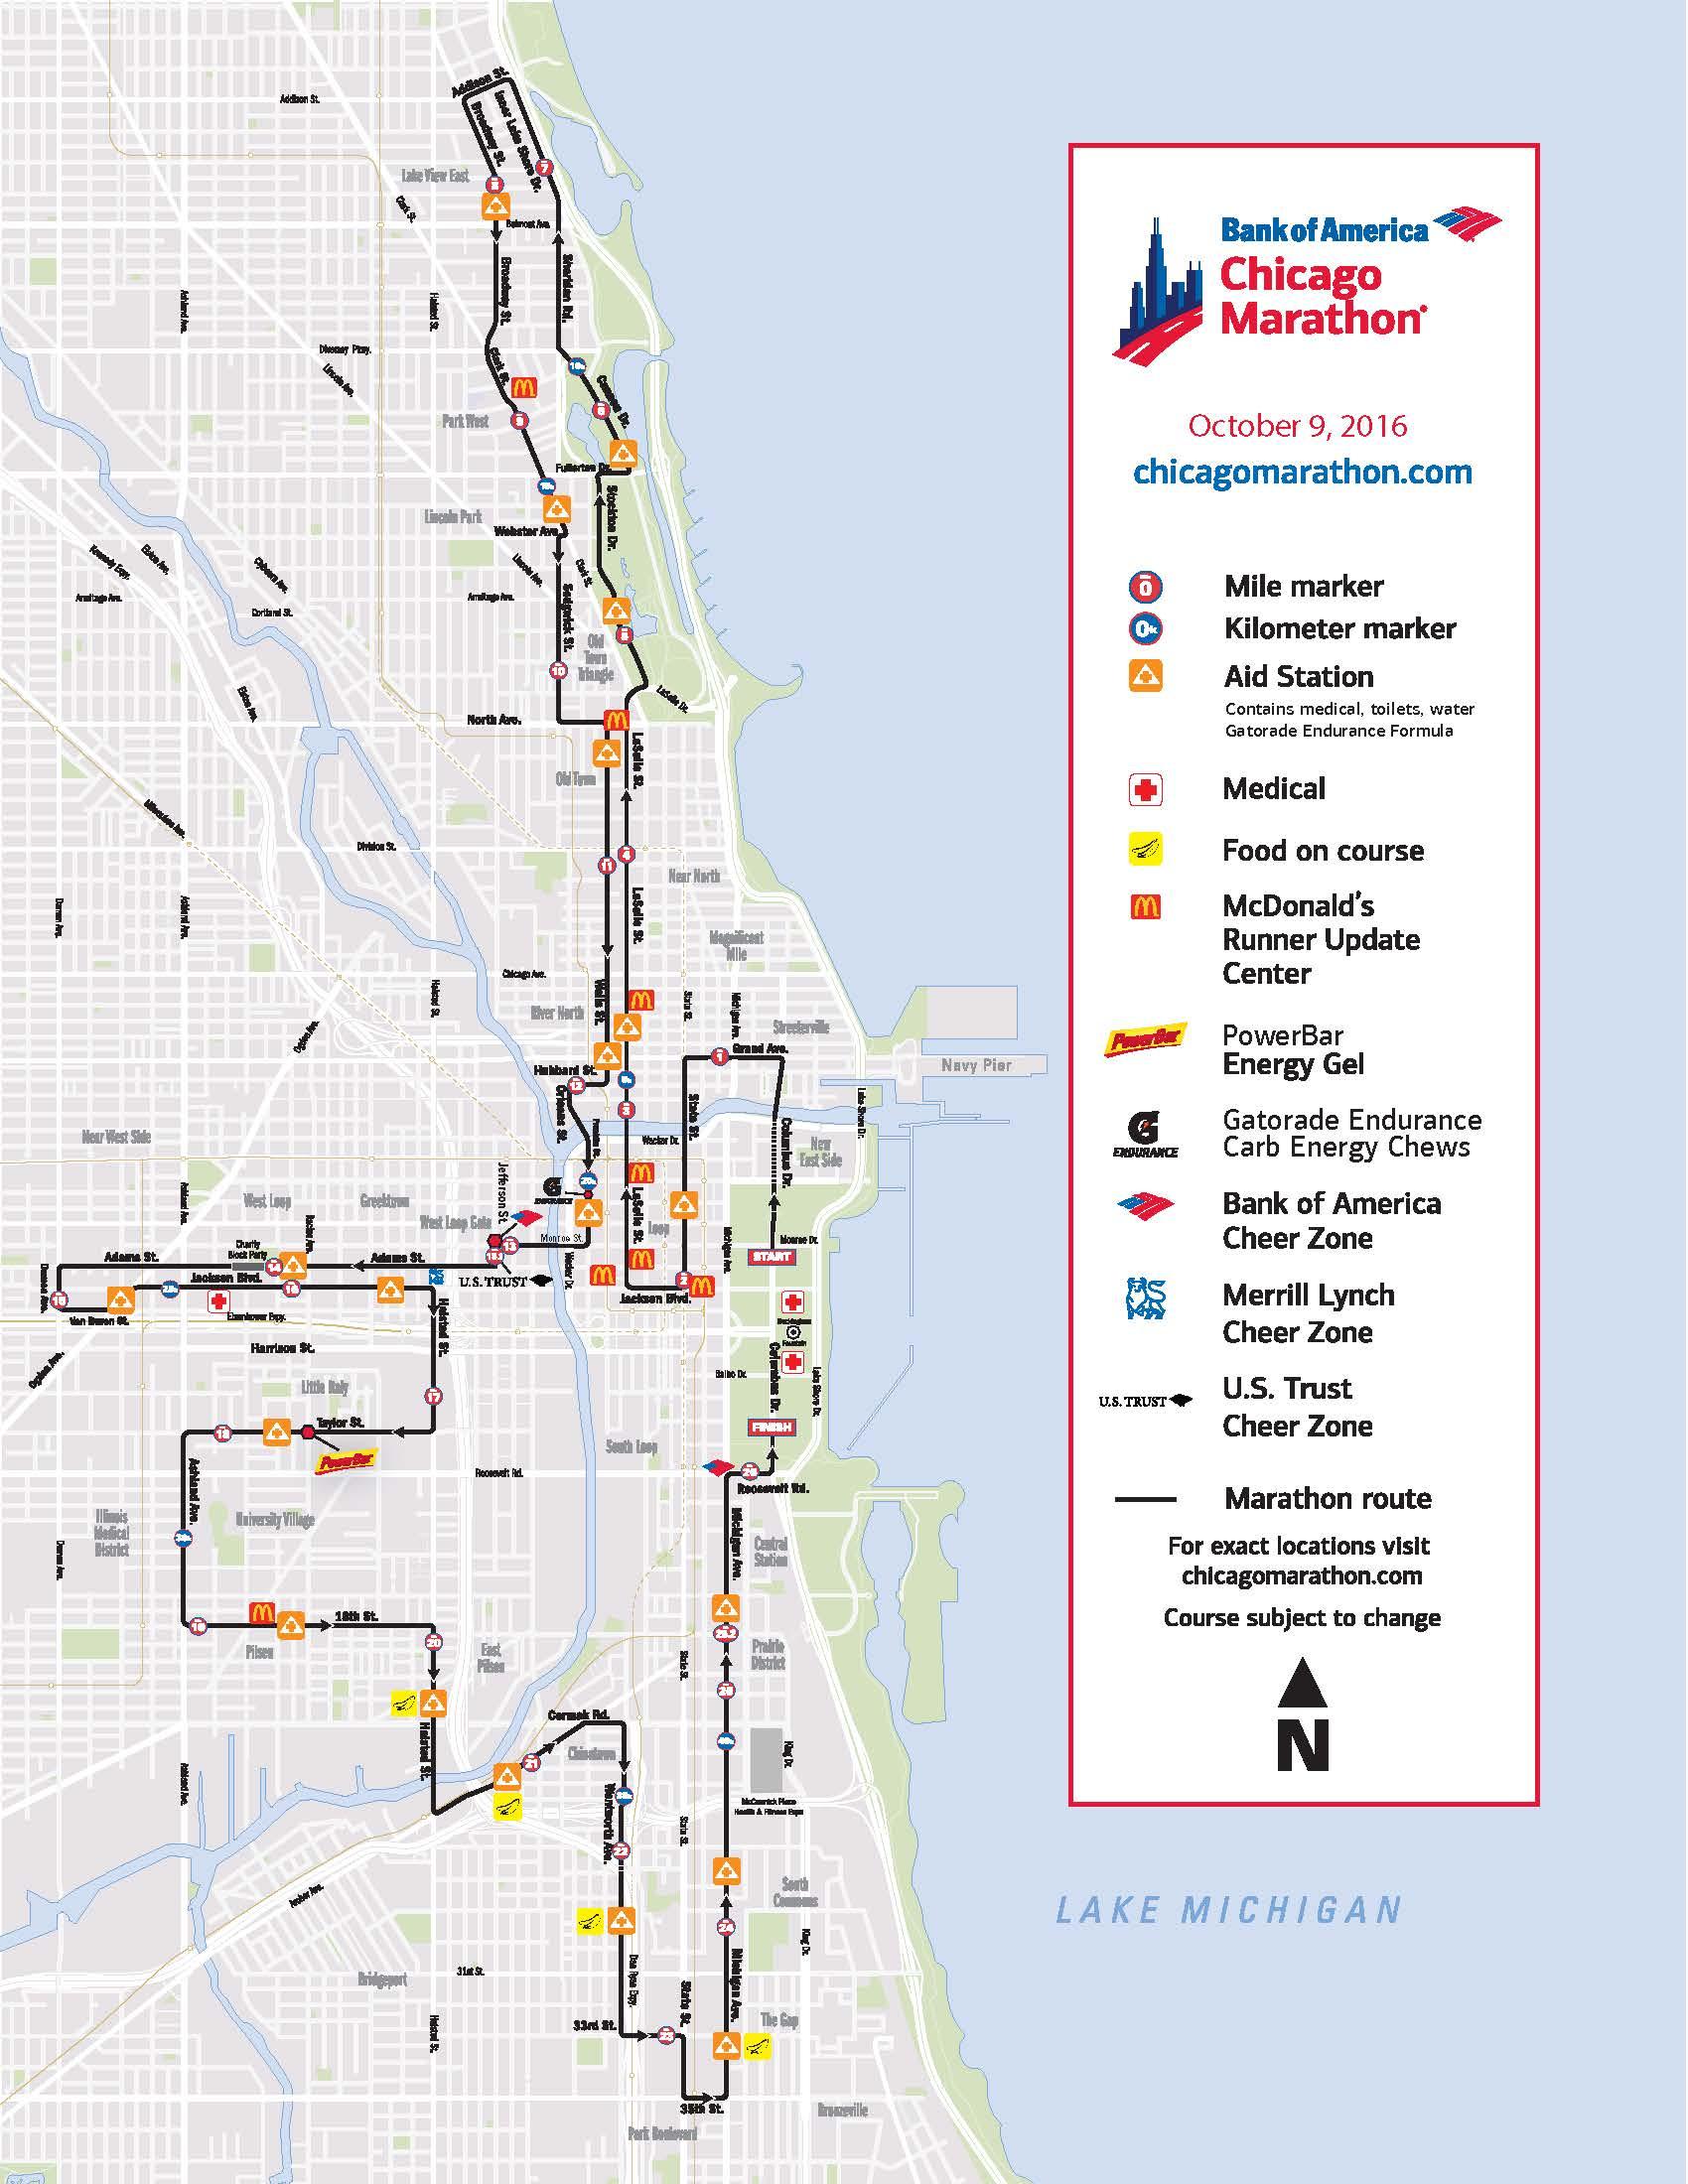 Chicago Marathon 2016 Street Closures  Chicago Association of